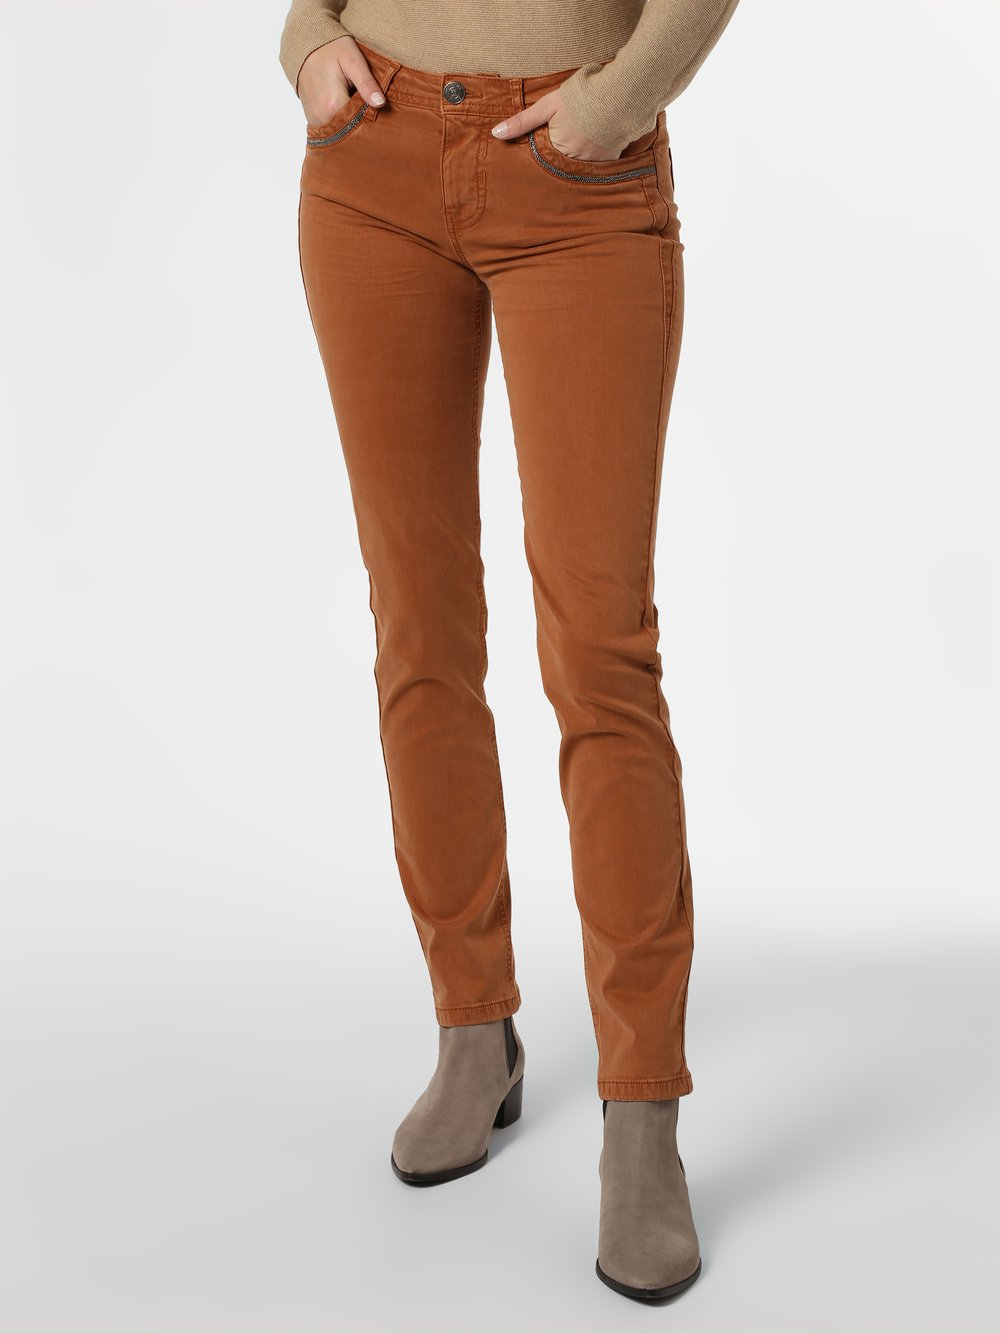 Blue Fire – Spodnie damskie, beżowy Van Graaf 445727-0001-03132